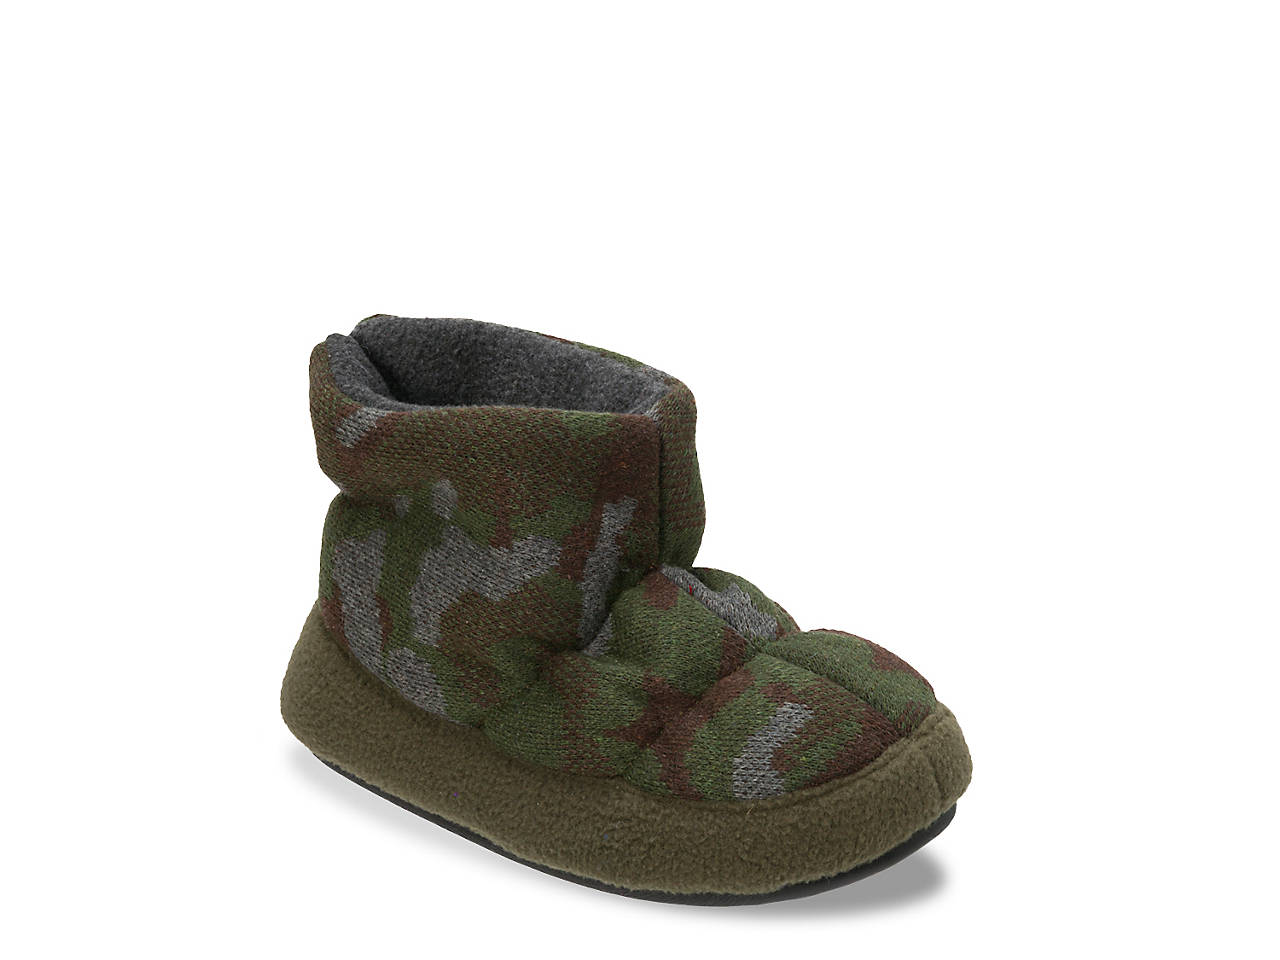 311987a5c Dearfoams Camo   Fleece Toddler   Youth Boot Slipper Kids Shoes